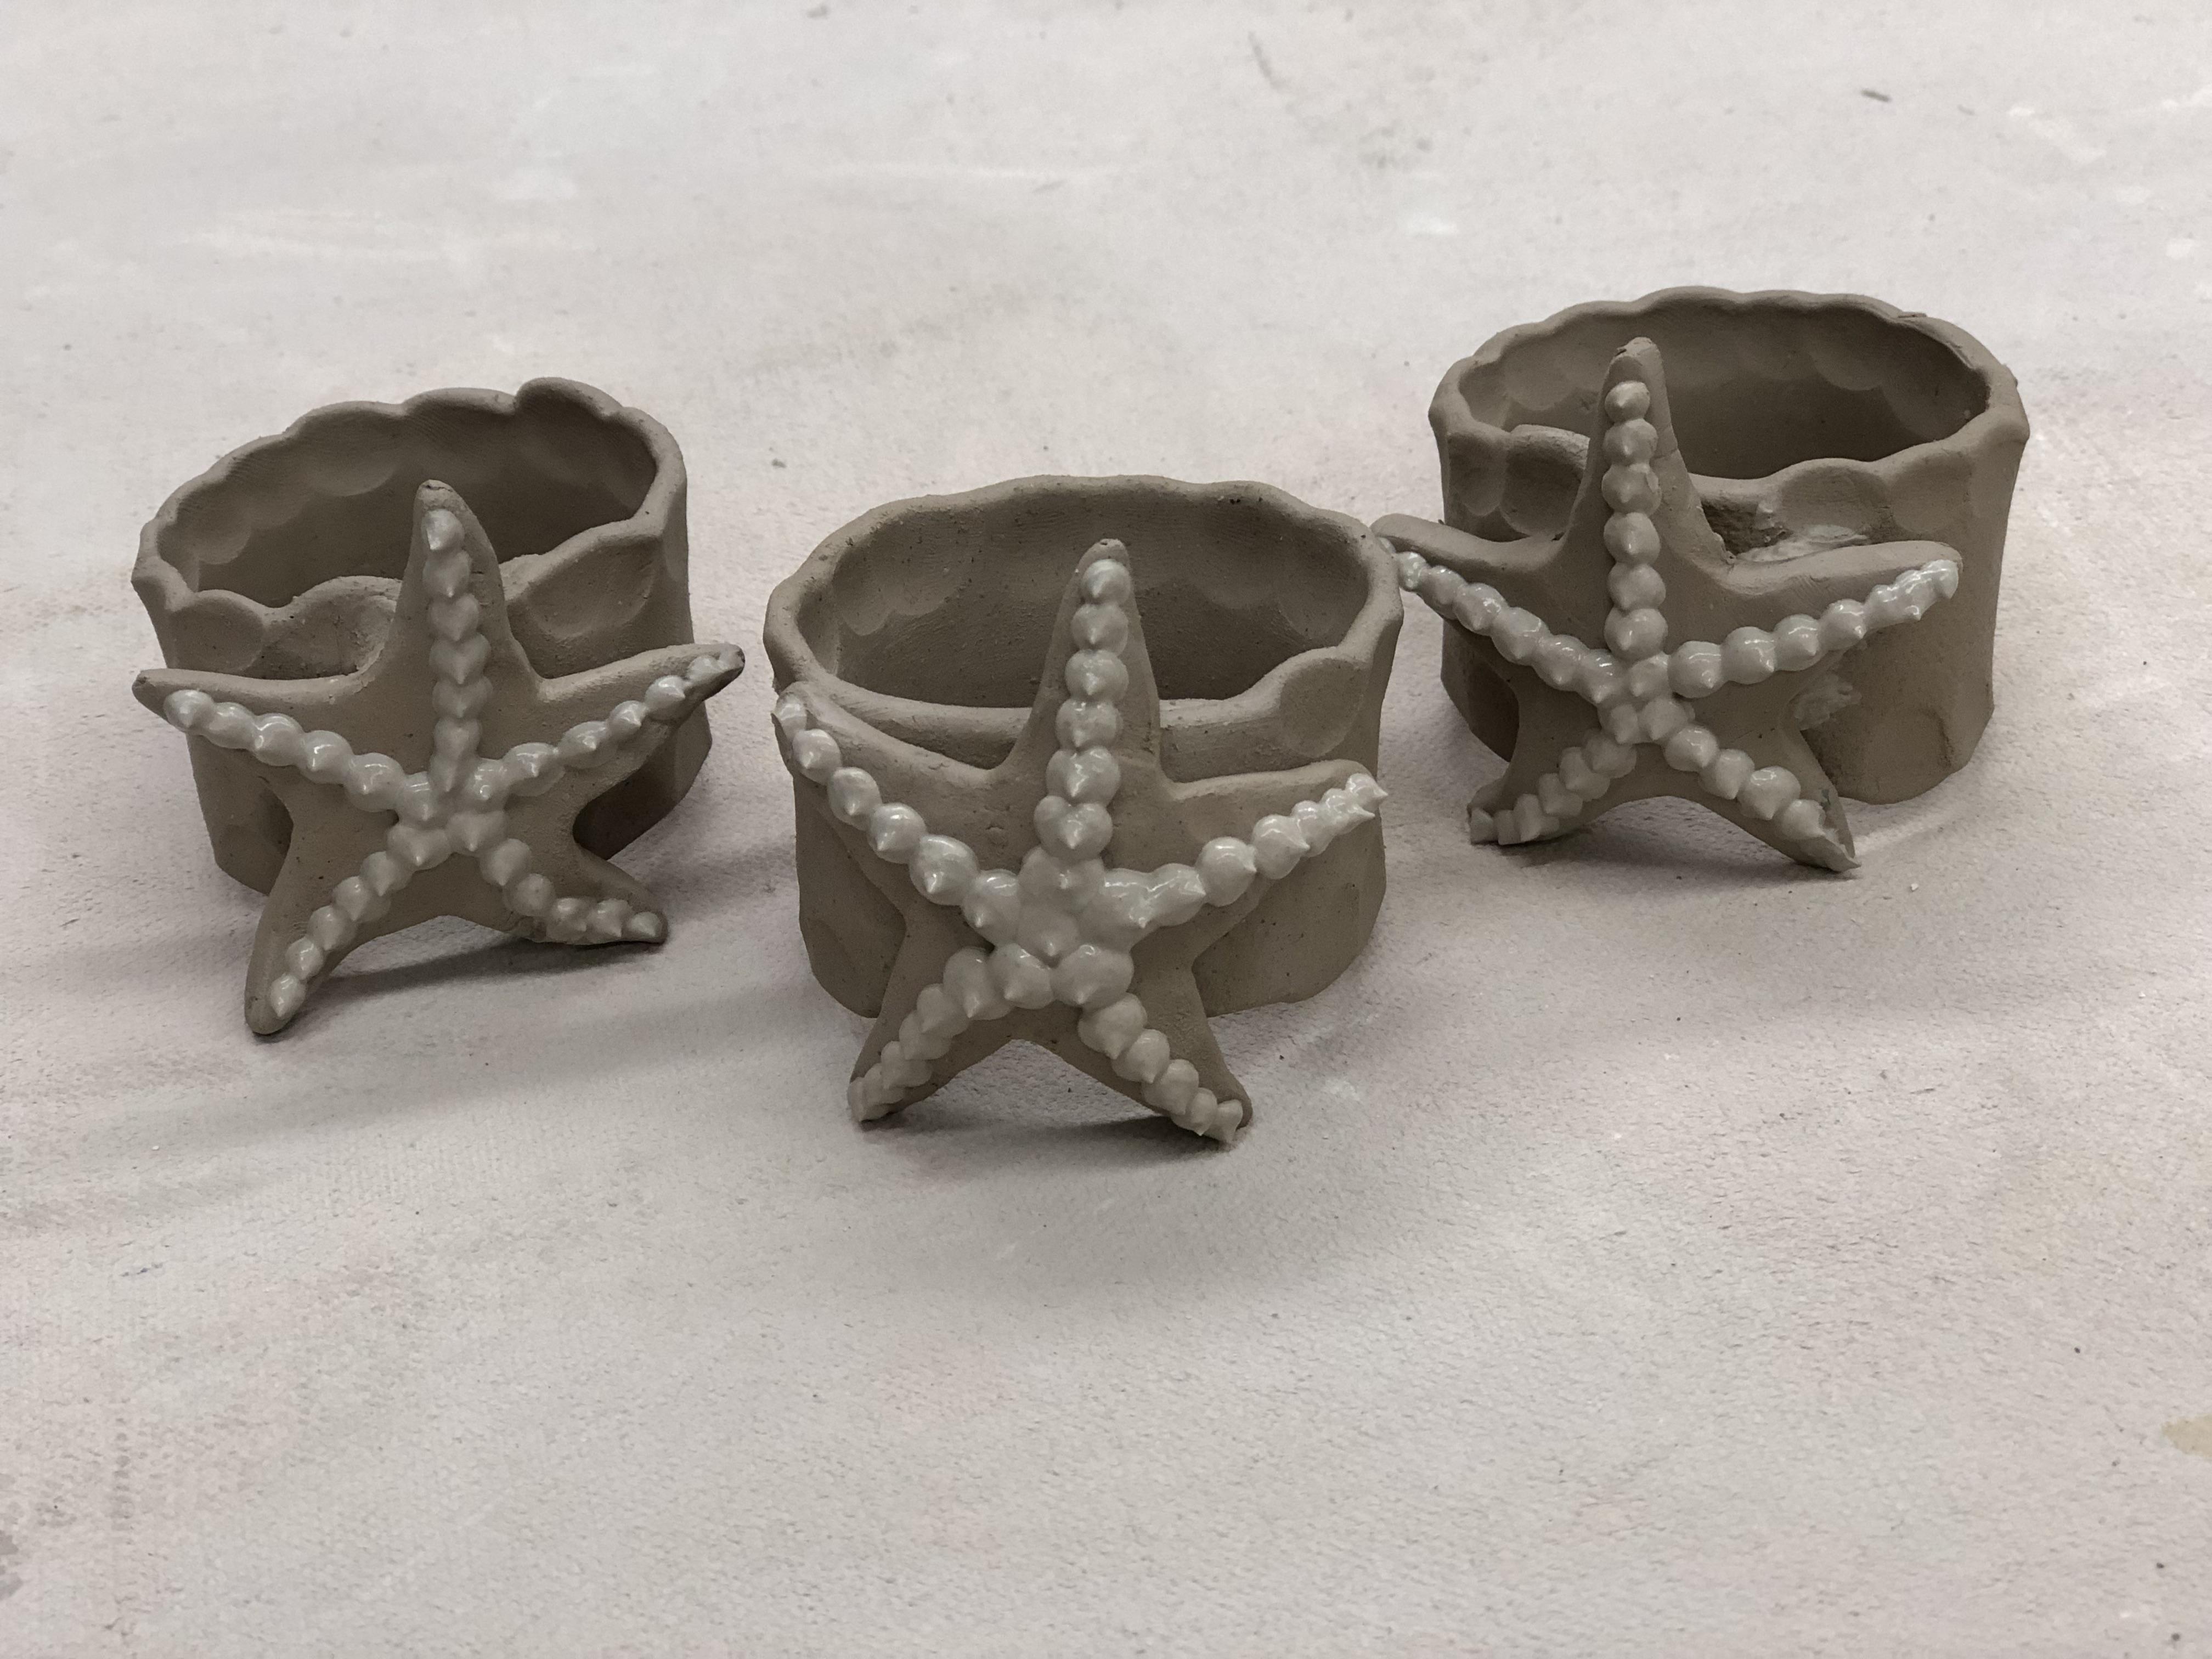 Ceramic Napkin Rings 6 30 8 30p 50 Artsea Living